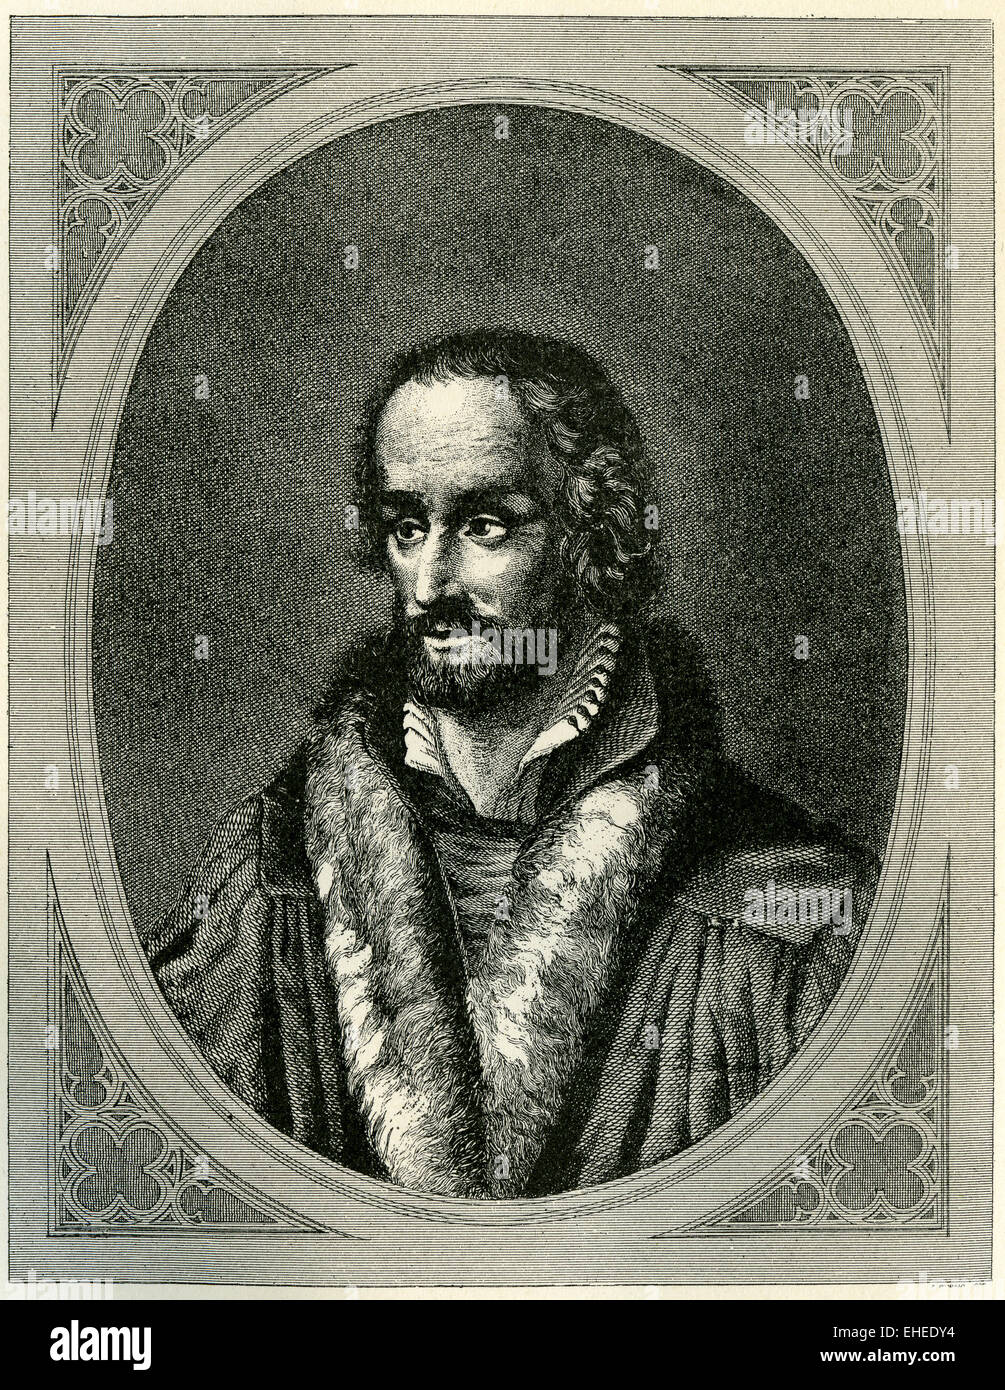 Reformer Philip Melanchthon of Germany. - Stock Image